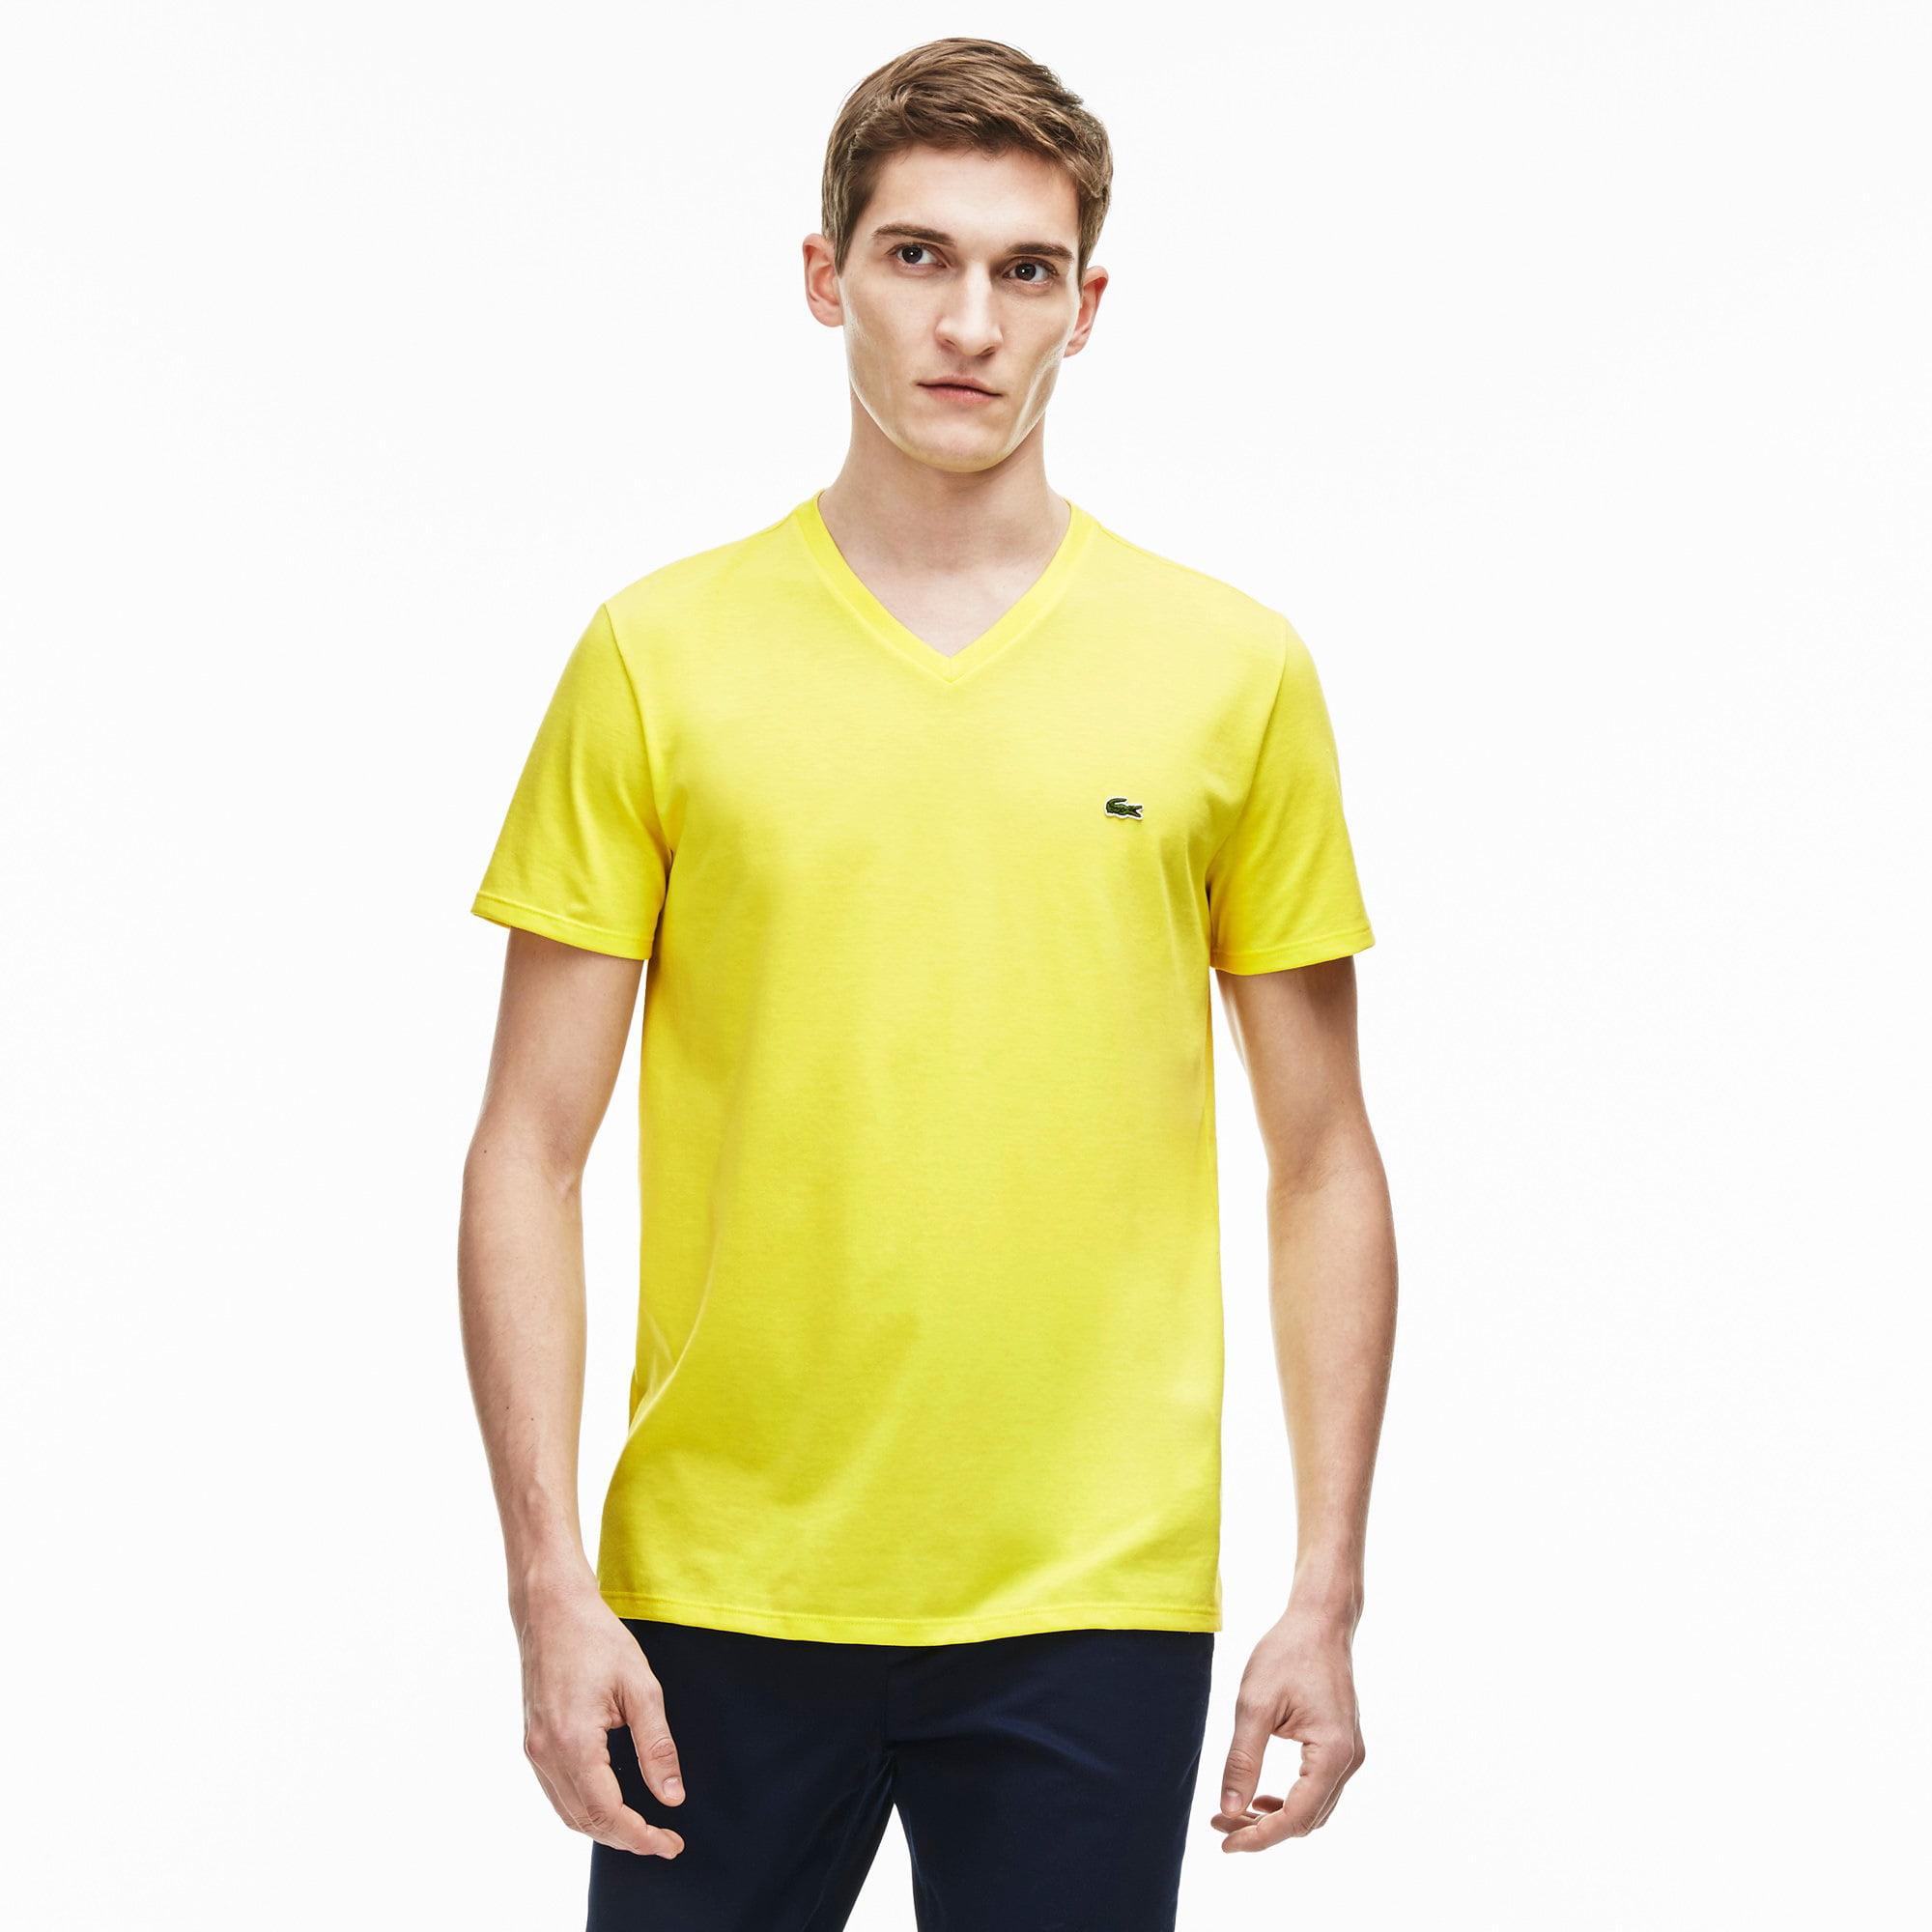 Lacoste Men's V-neck Pima Cotton Jersey T-shirt Daphne Yellow Medium